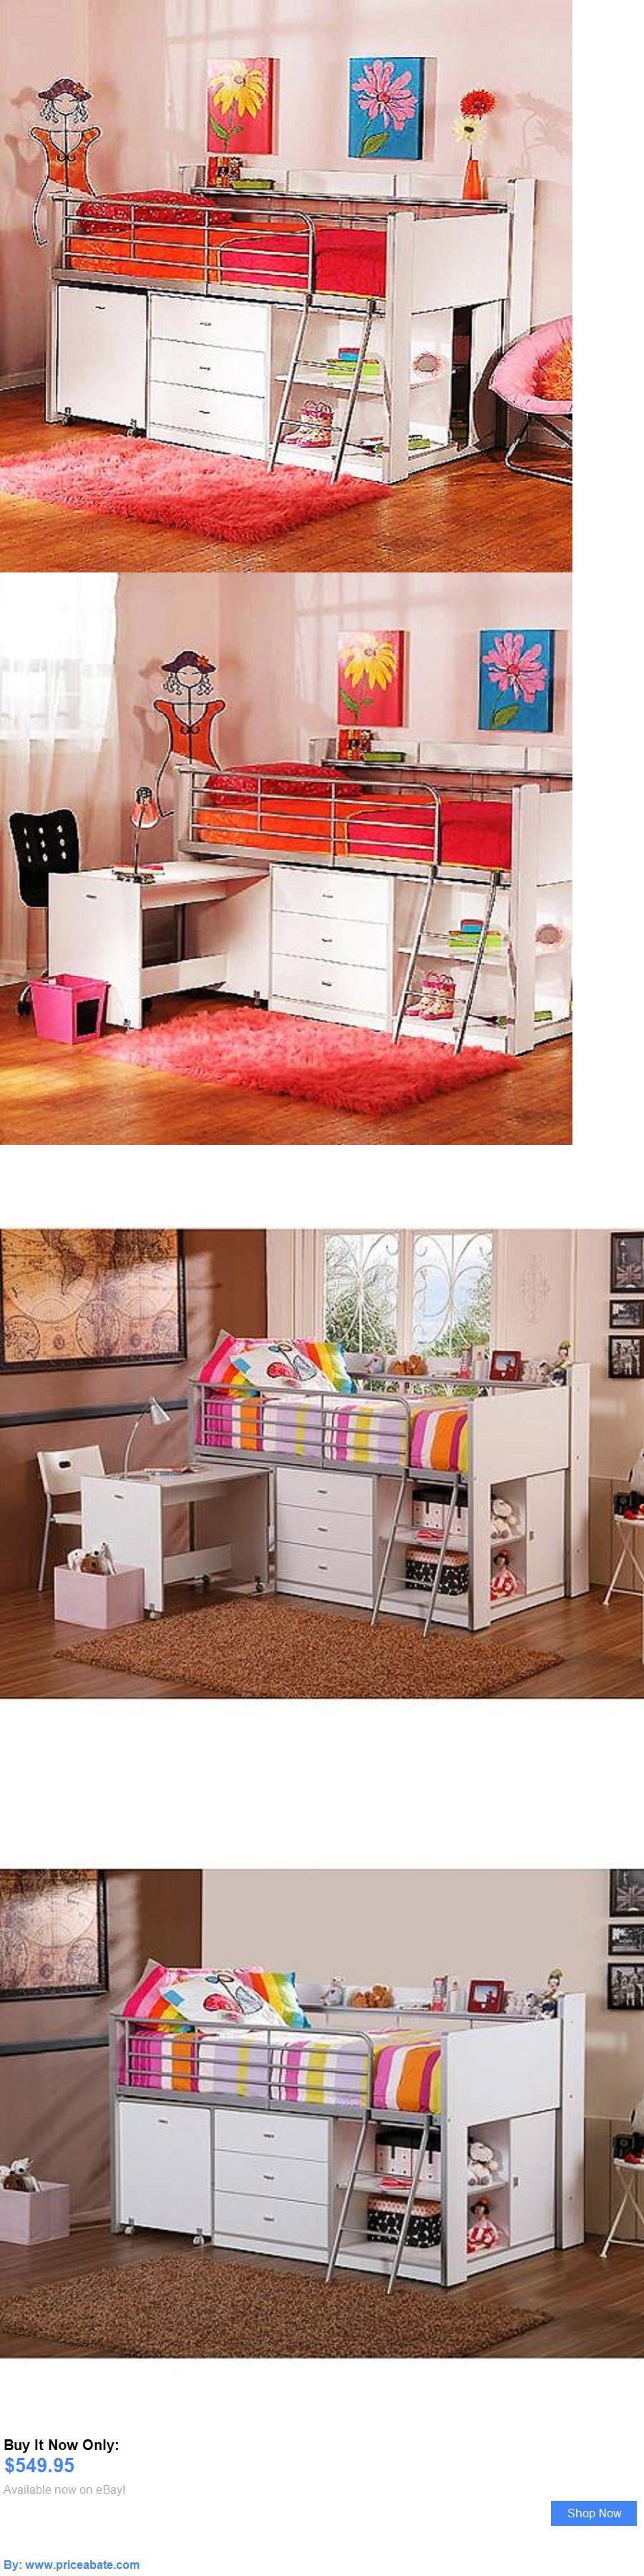 Kids furniture twin loft bunk bed storage desk white kids bedroom